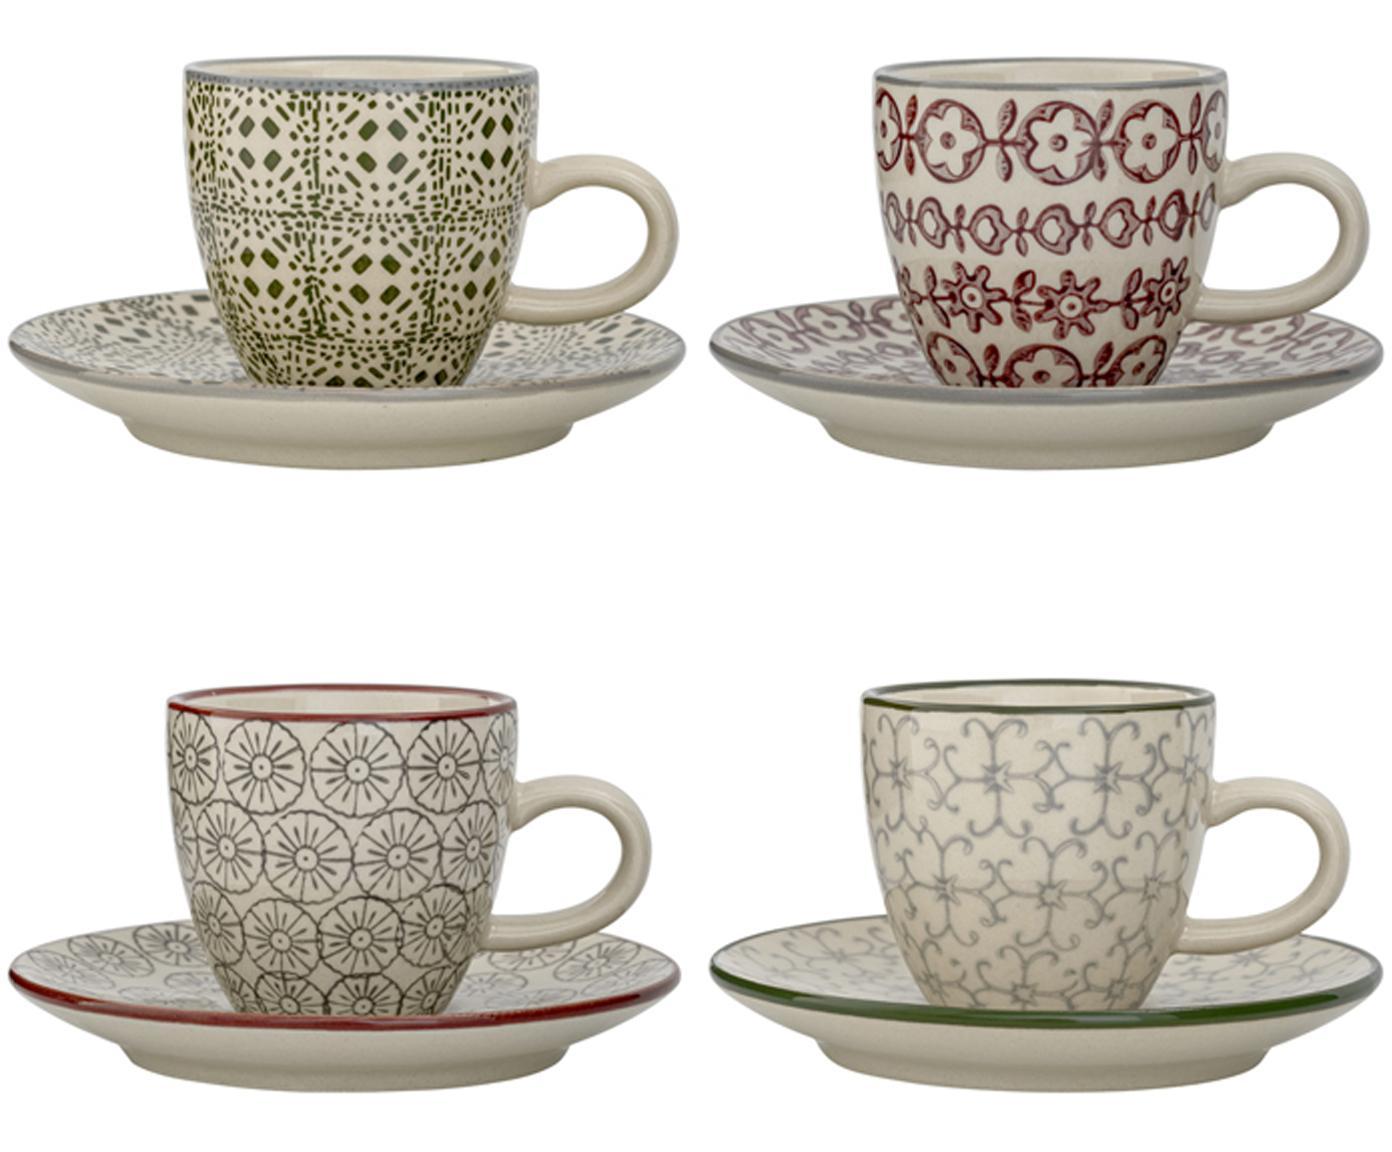 Set tazze da caffè Karine, 8 pz., Terracotta, Bianco, verde, rosso, grigio, Ø 6 x Alt. 6 cm